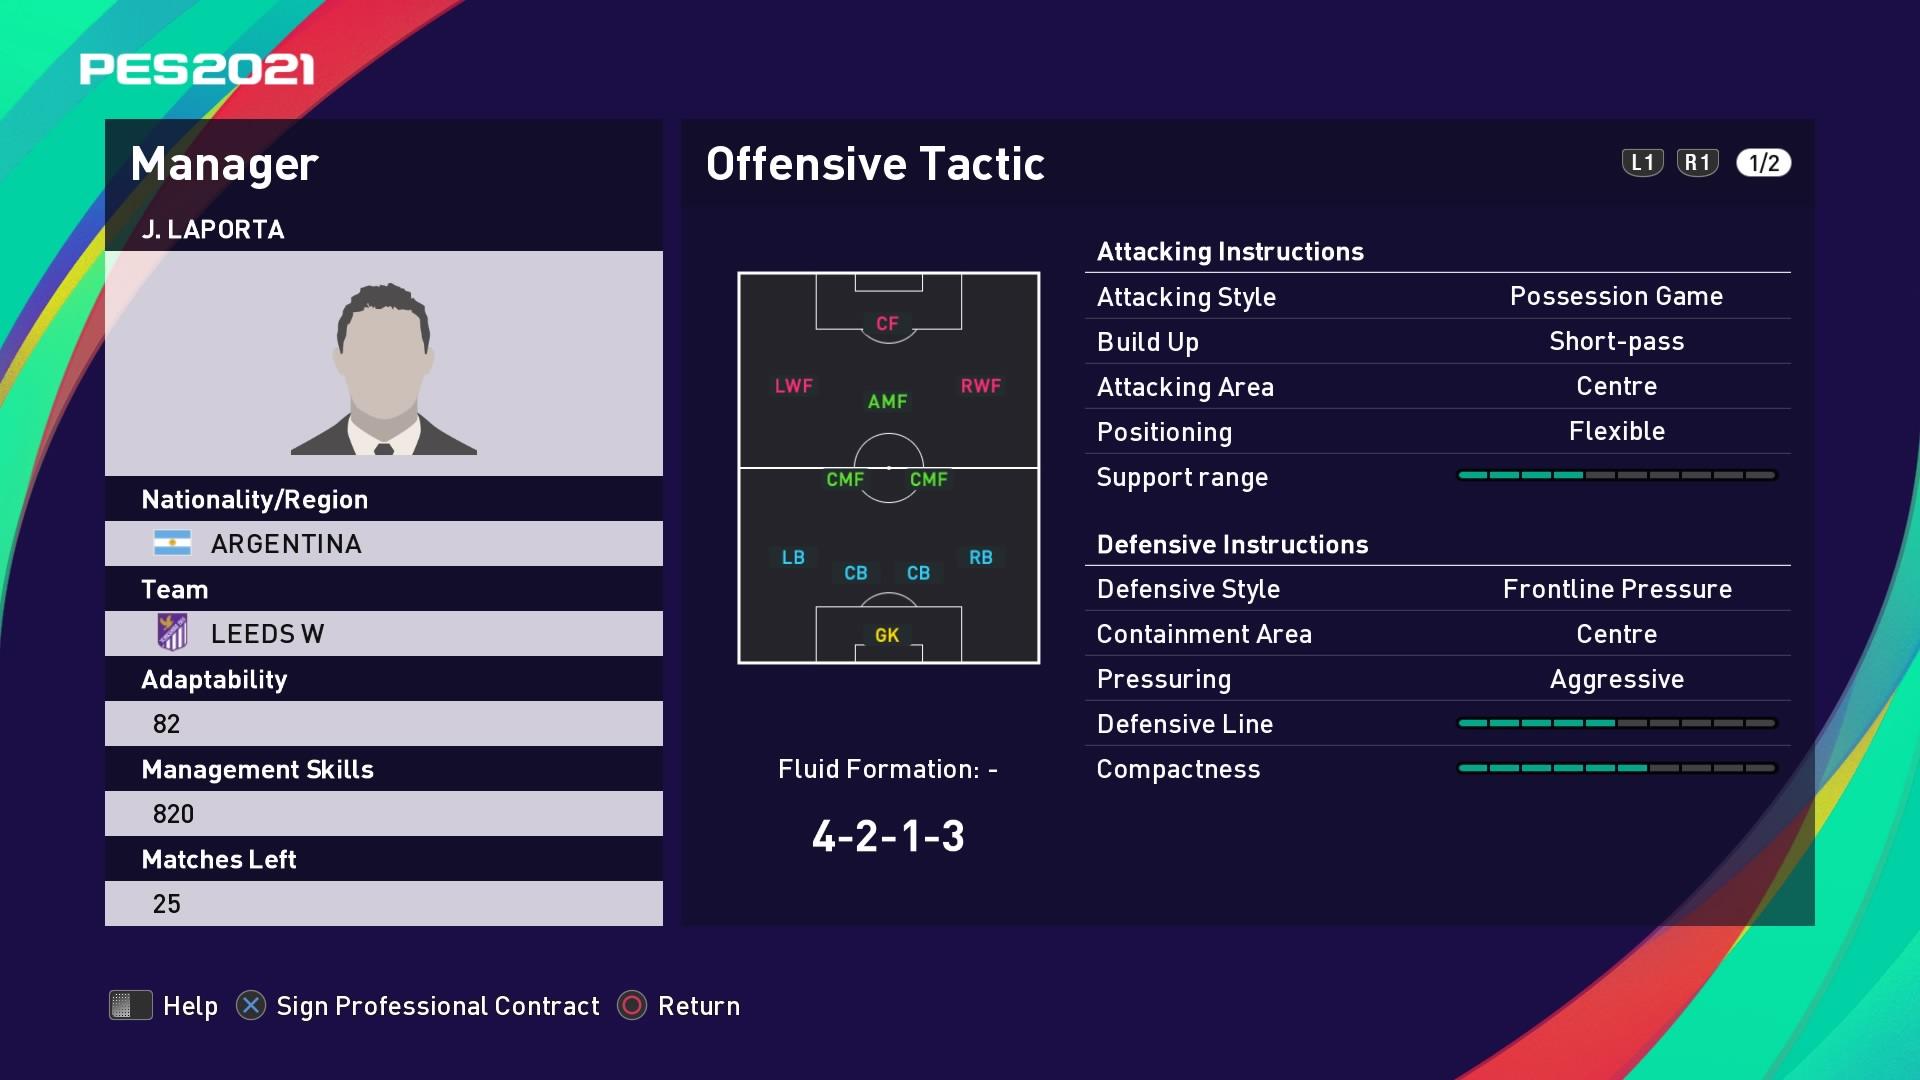 J. Laporta (2) (Marcelo Bielsa) Offensive Tactic in PES 2021 myClub